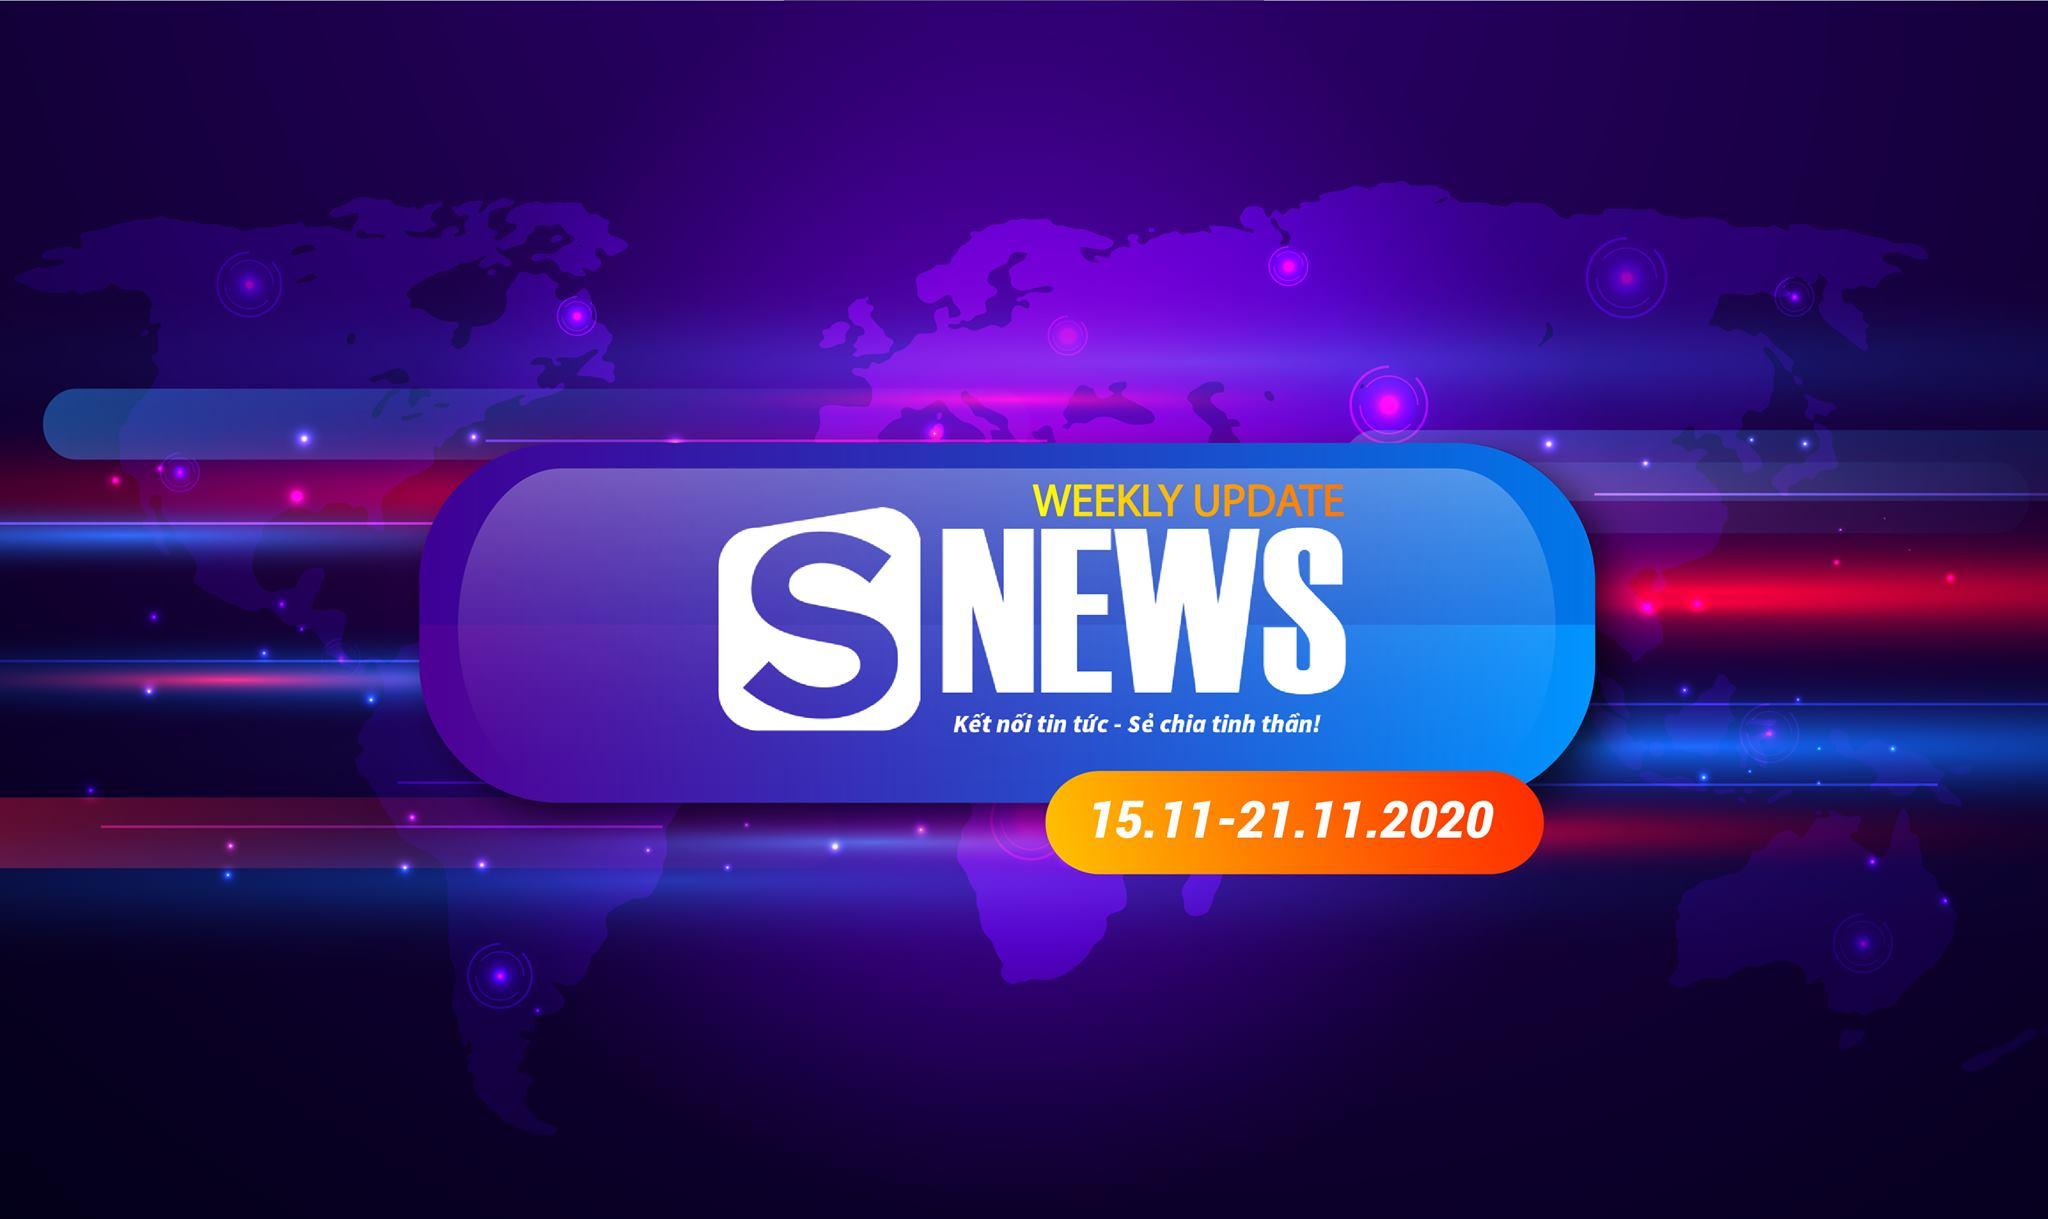 Tổng hợp tin tức Sapo tuần qua: 15.11 - 21.11.2020